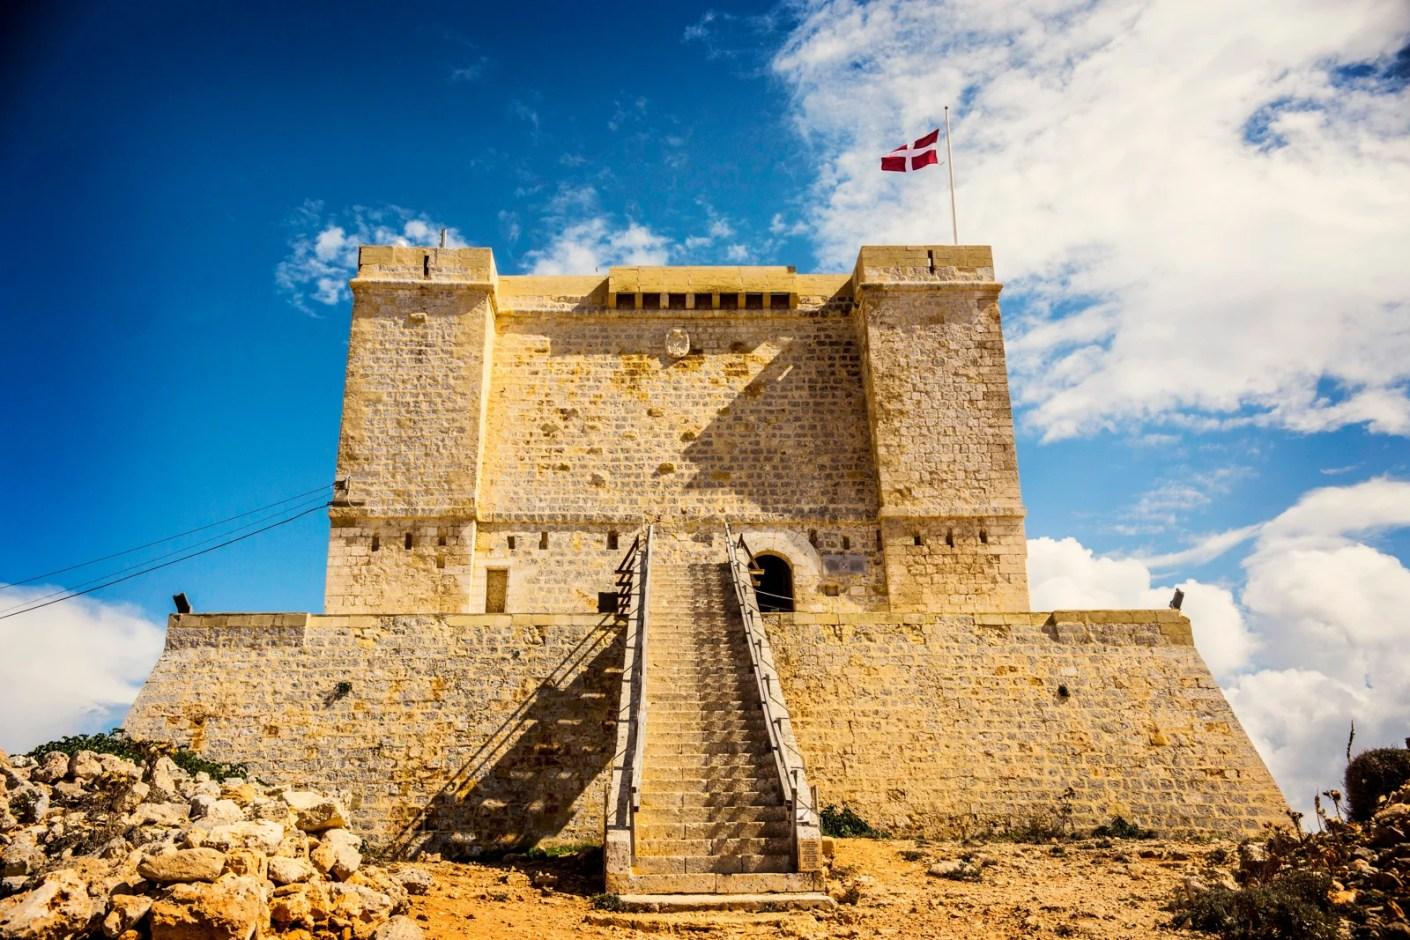 Santa Marija Tower, Comino, Malta. (Photo by Sun_Shine / Shutterstock)